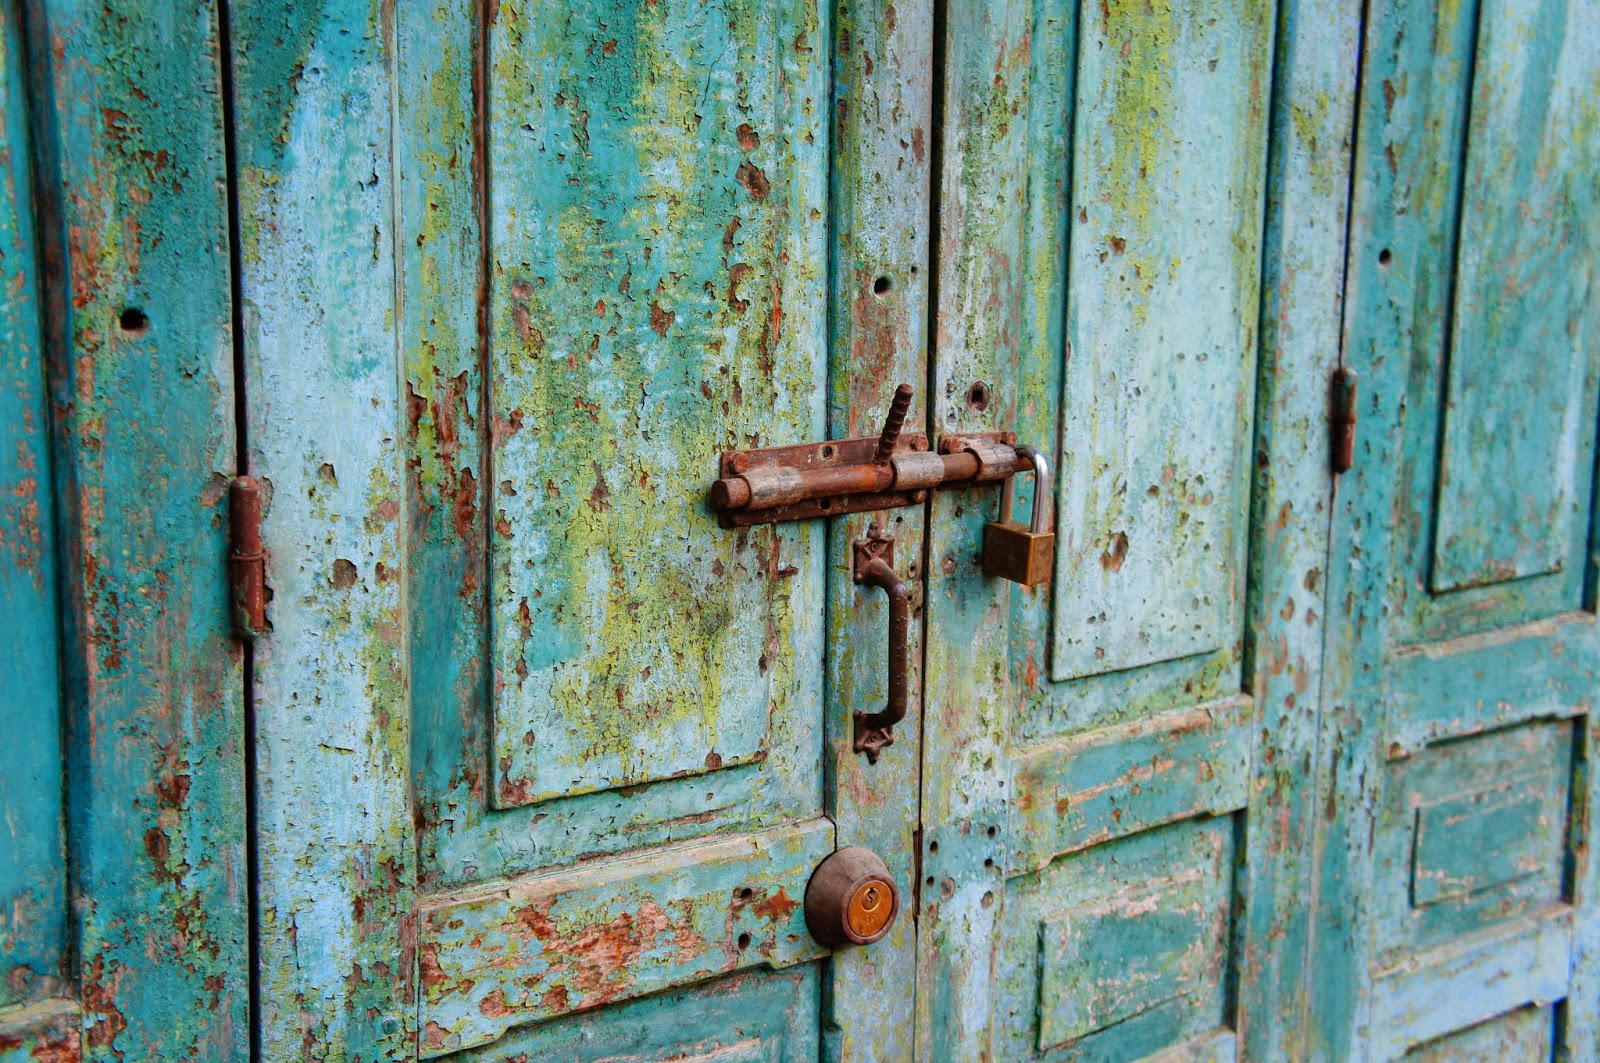 Luang Prabang - I love looking at weather-beaten doors